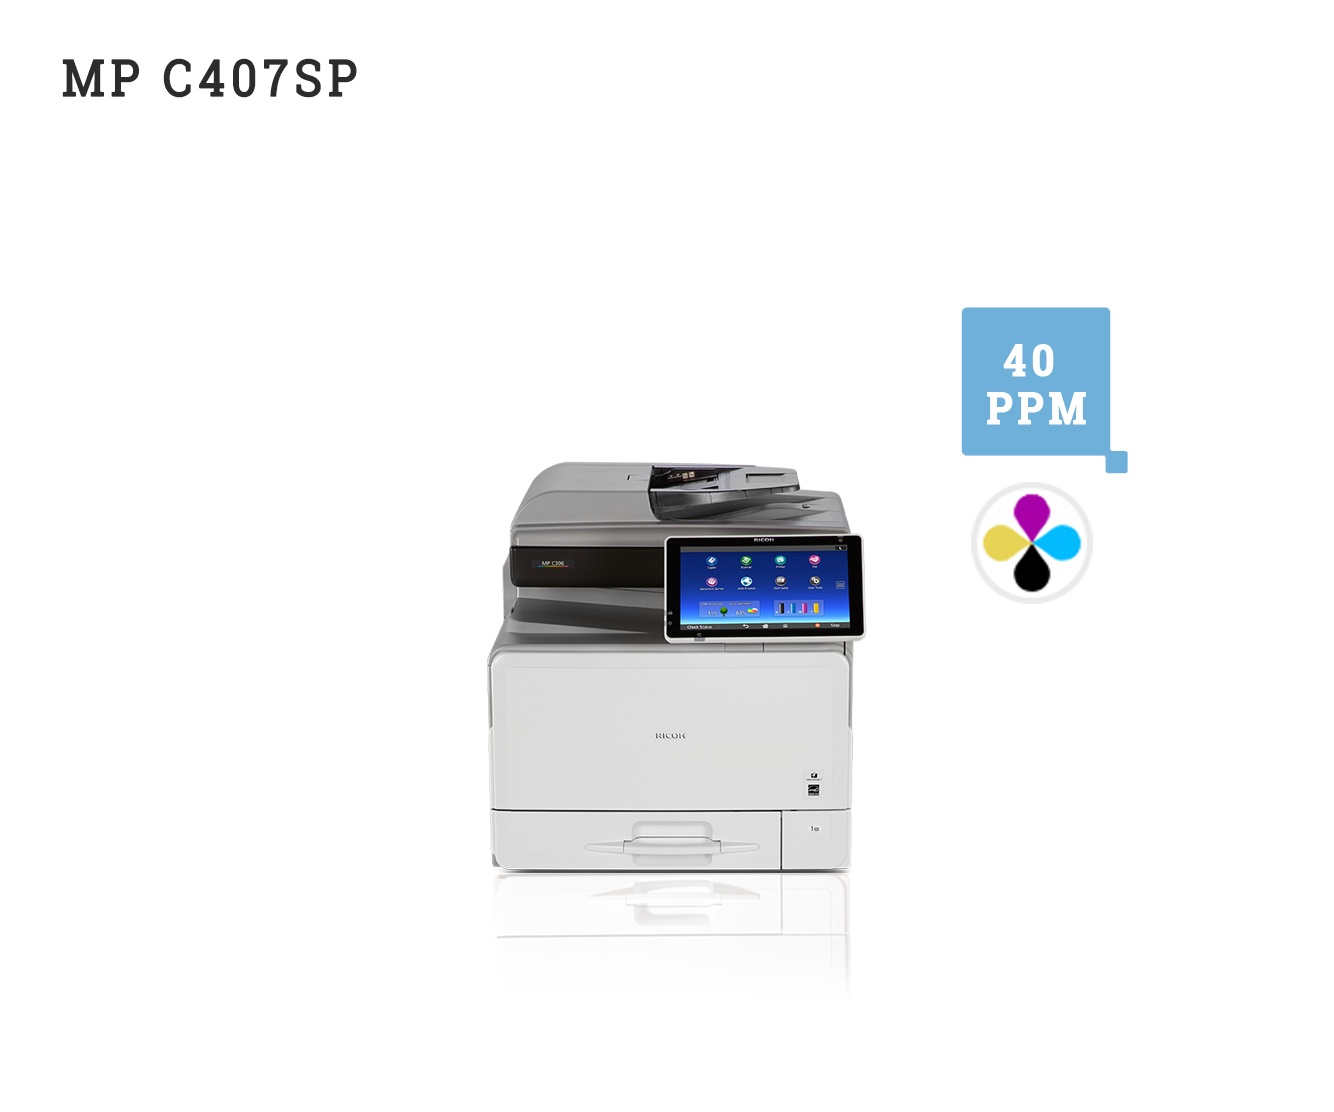 MPC407